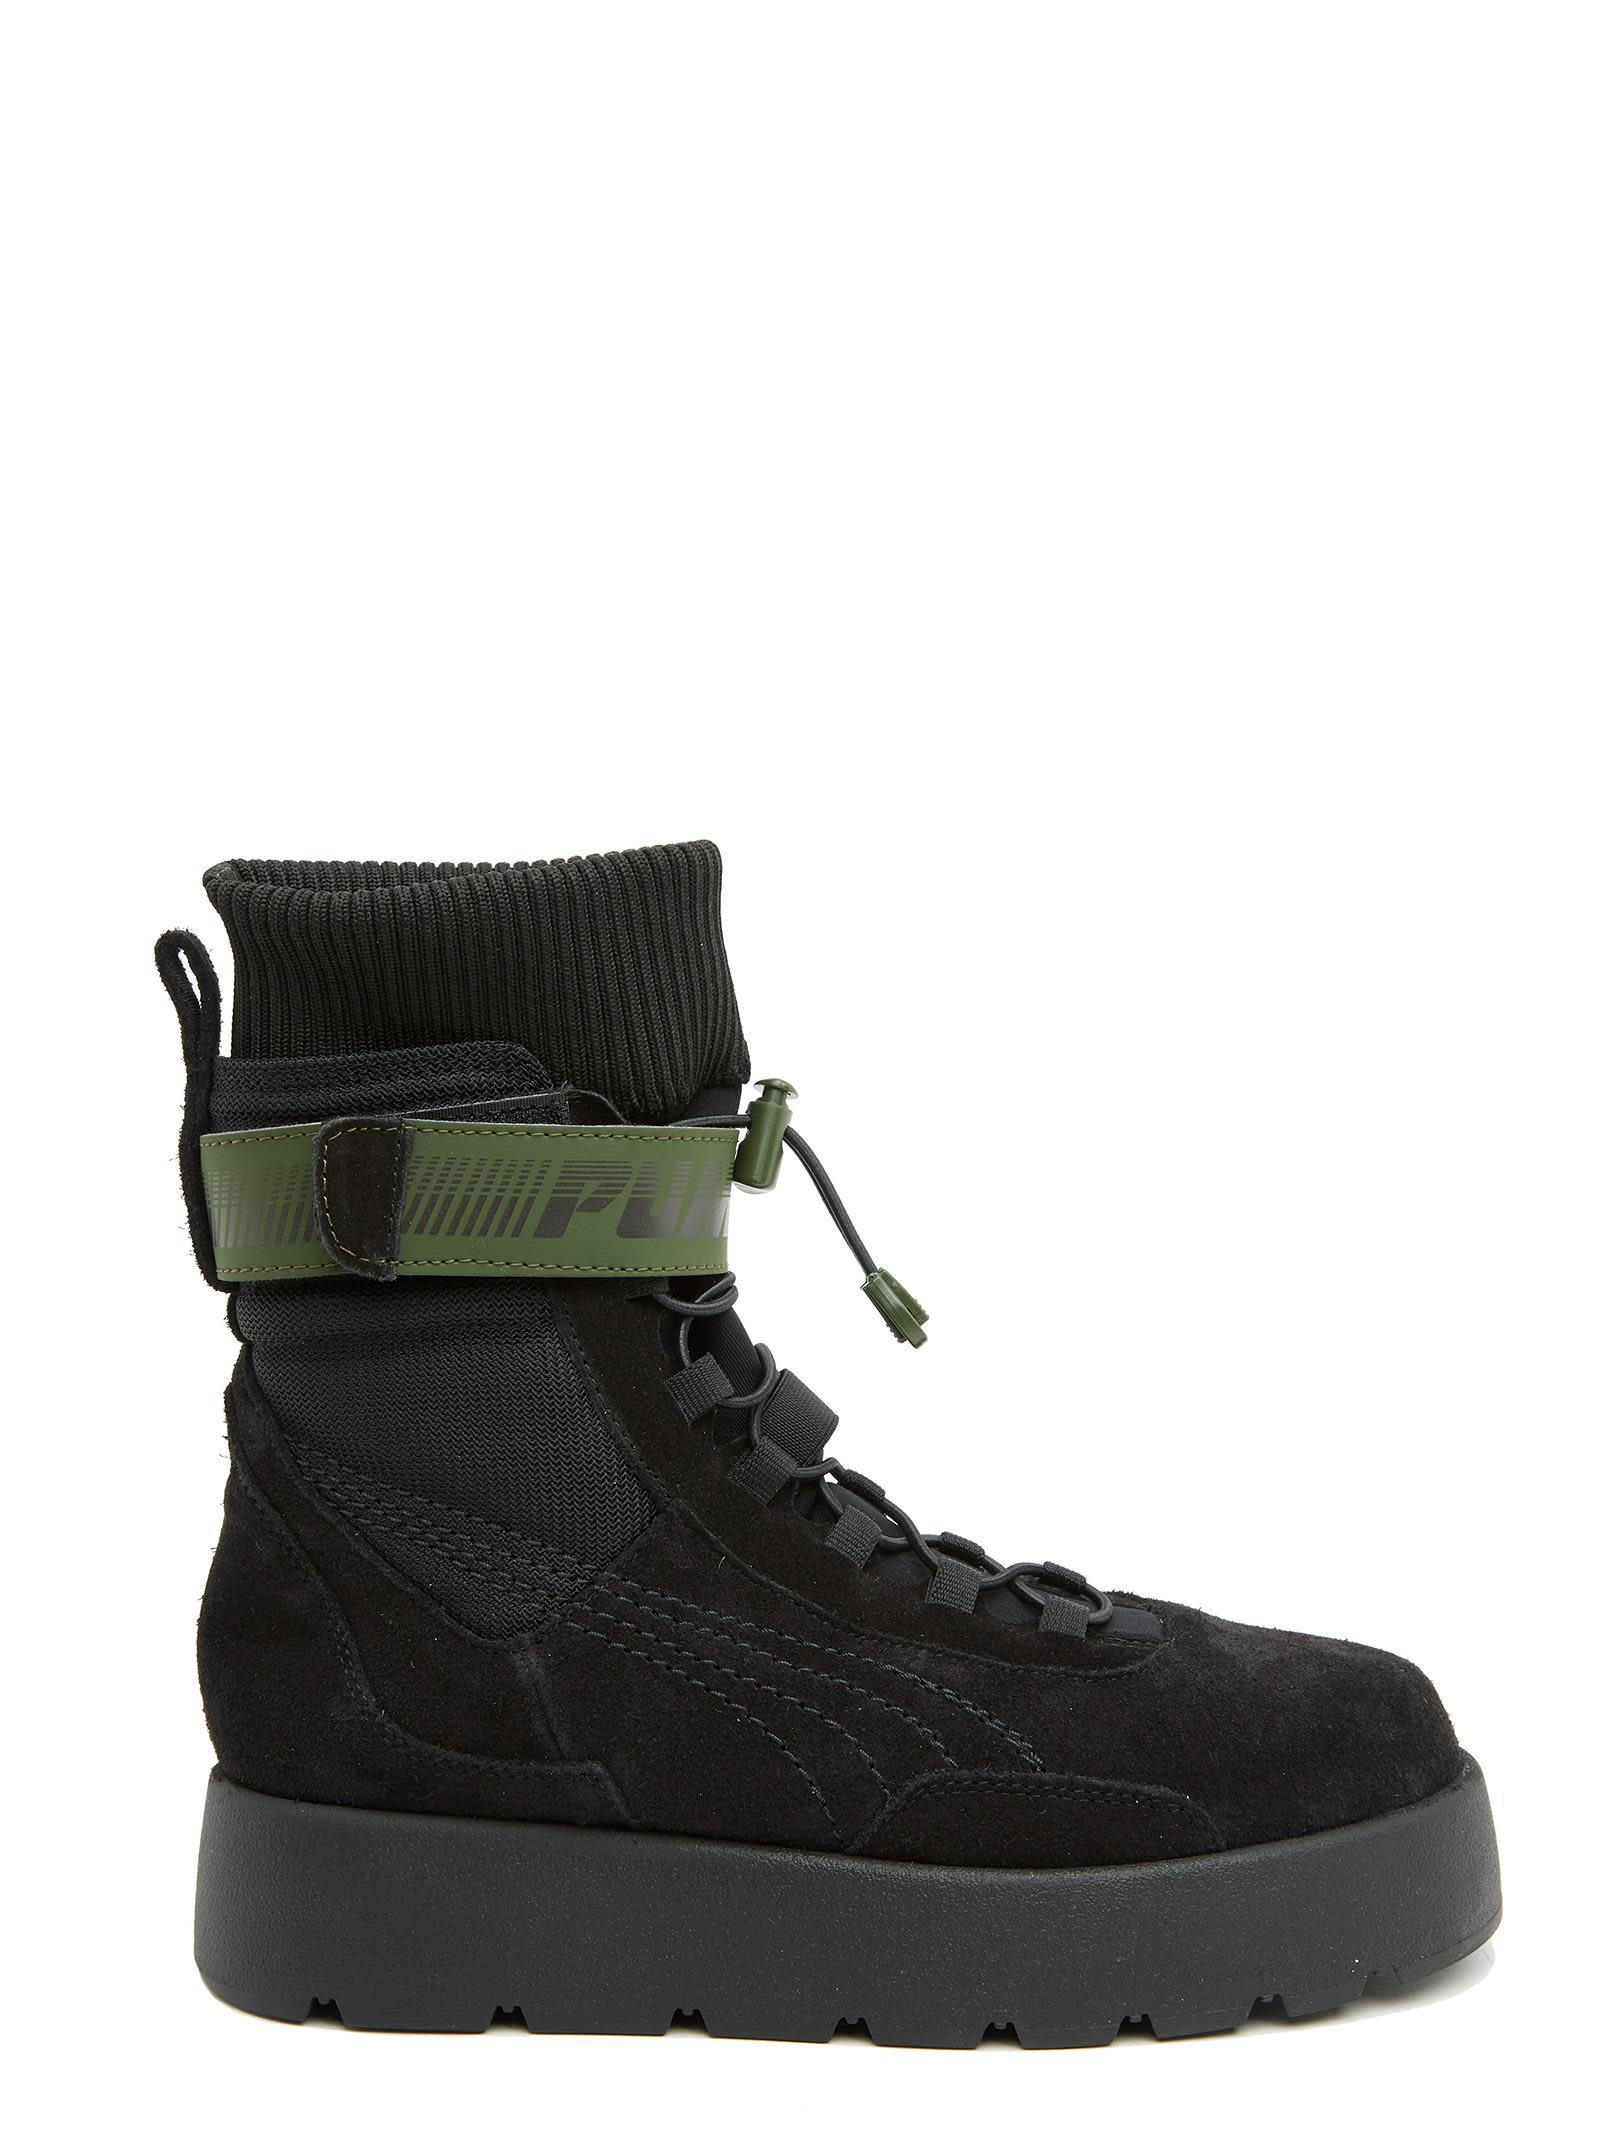 brand new 41bf9 1fe7d Fenty Puma By Rihanna Scuba Shoes in Black